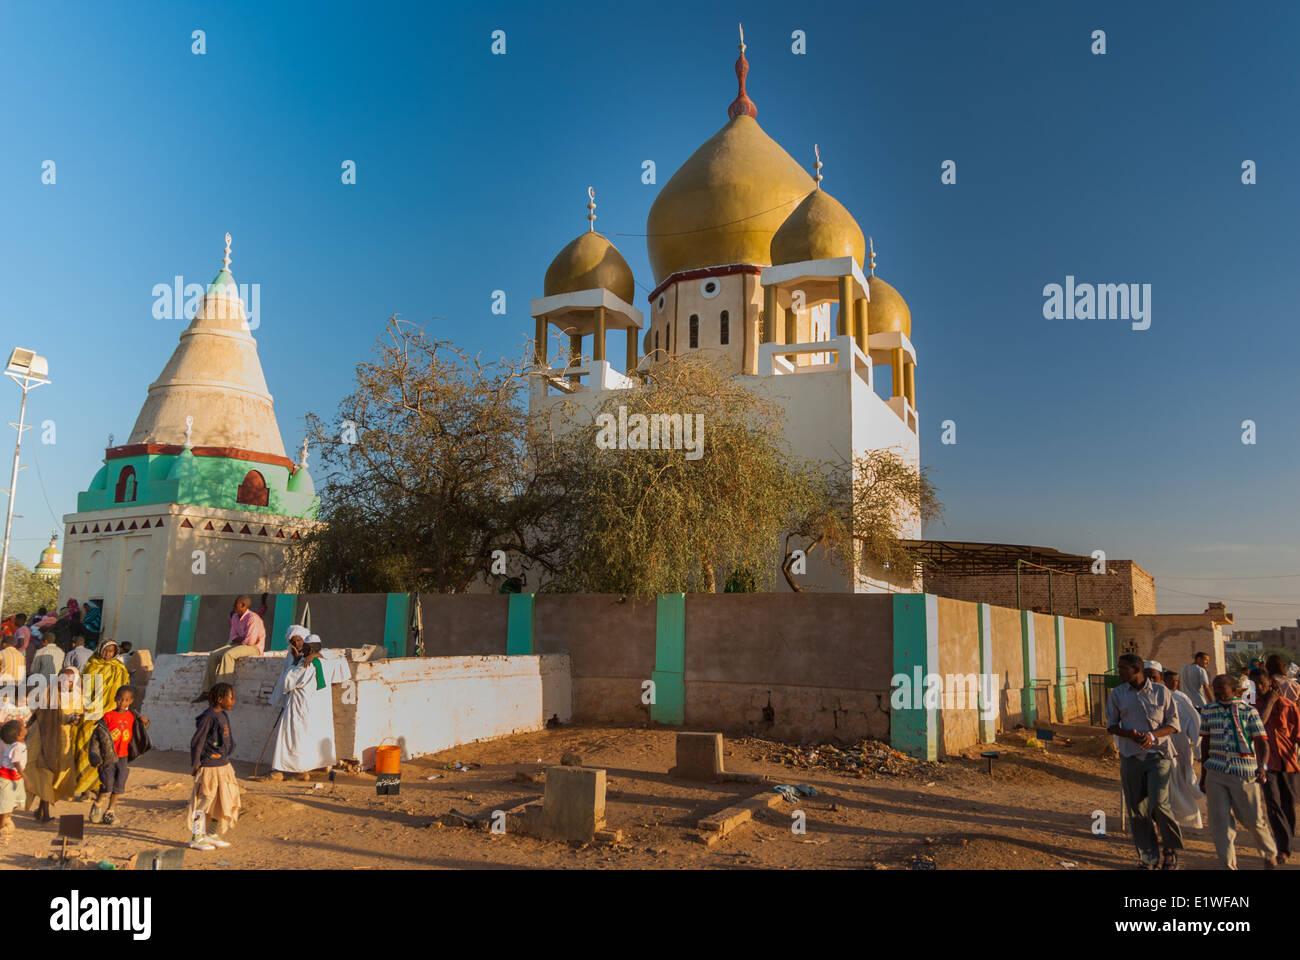 Sheikh Hamad al-Nil Tomb and Mosque, Omdurman, Sudan - Stock Image